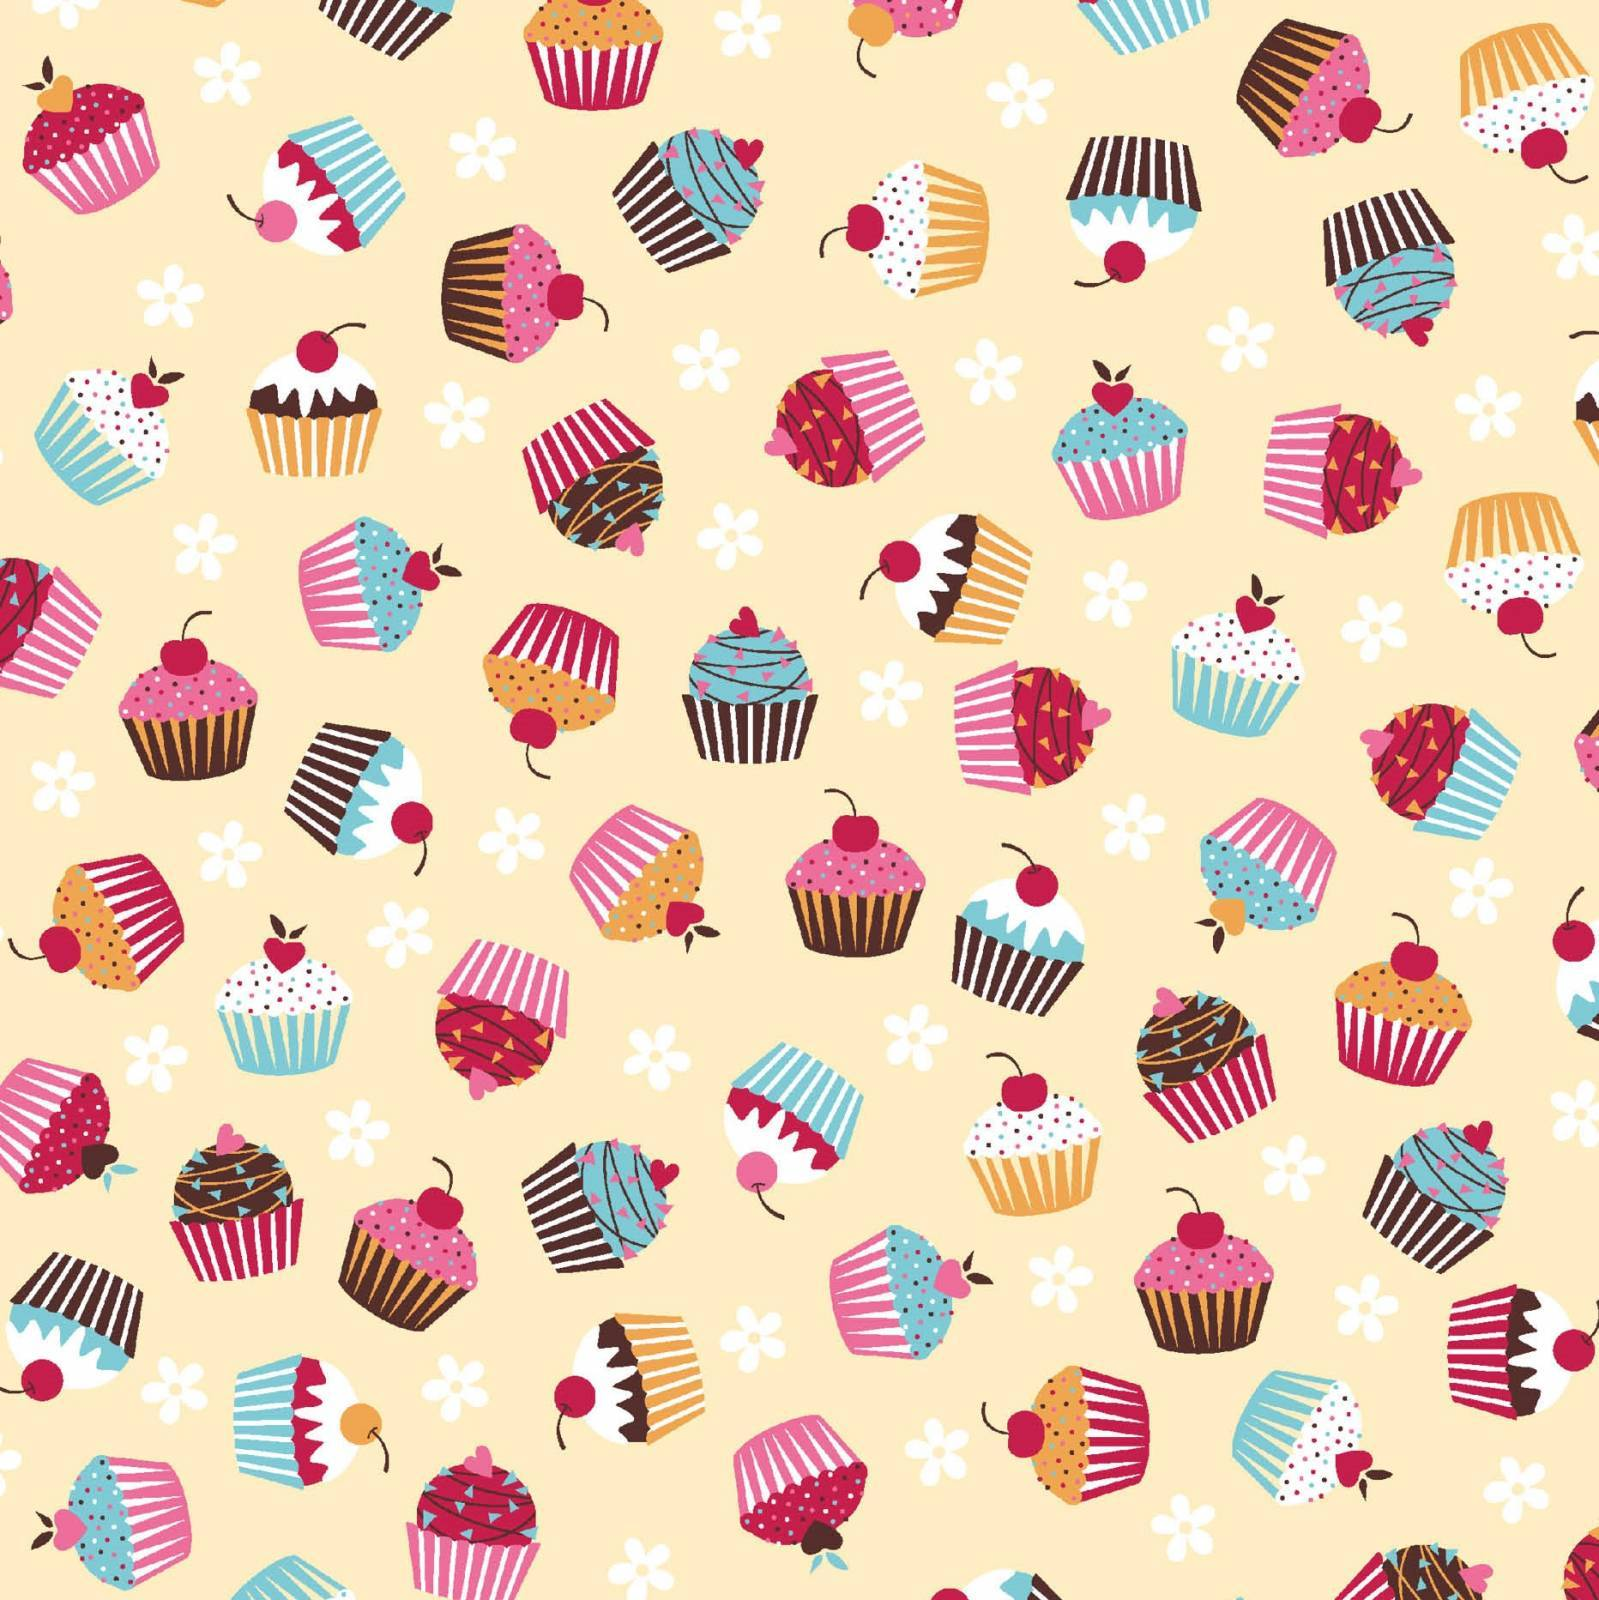 Cupcake fundo bege - BAÚ DA VOVÓ